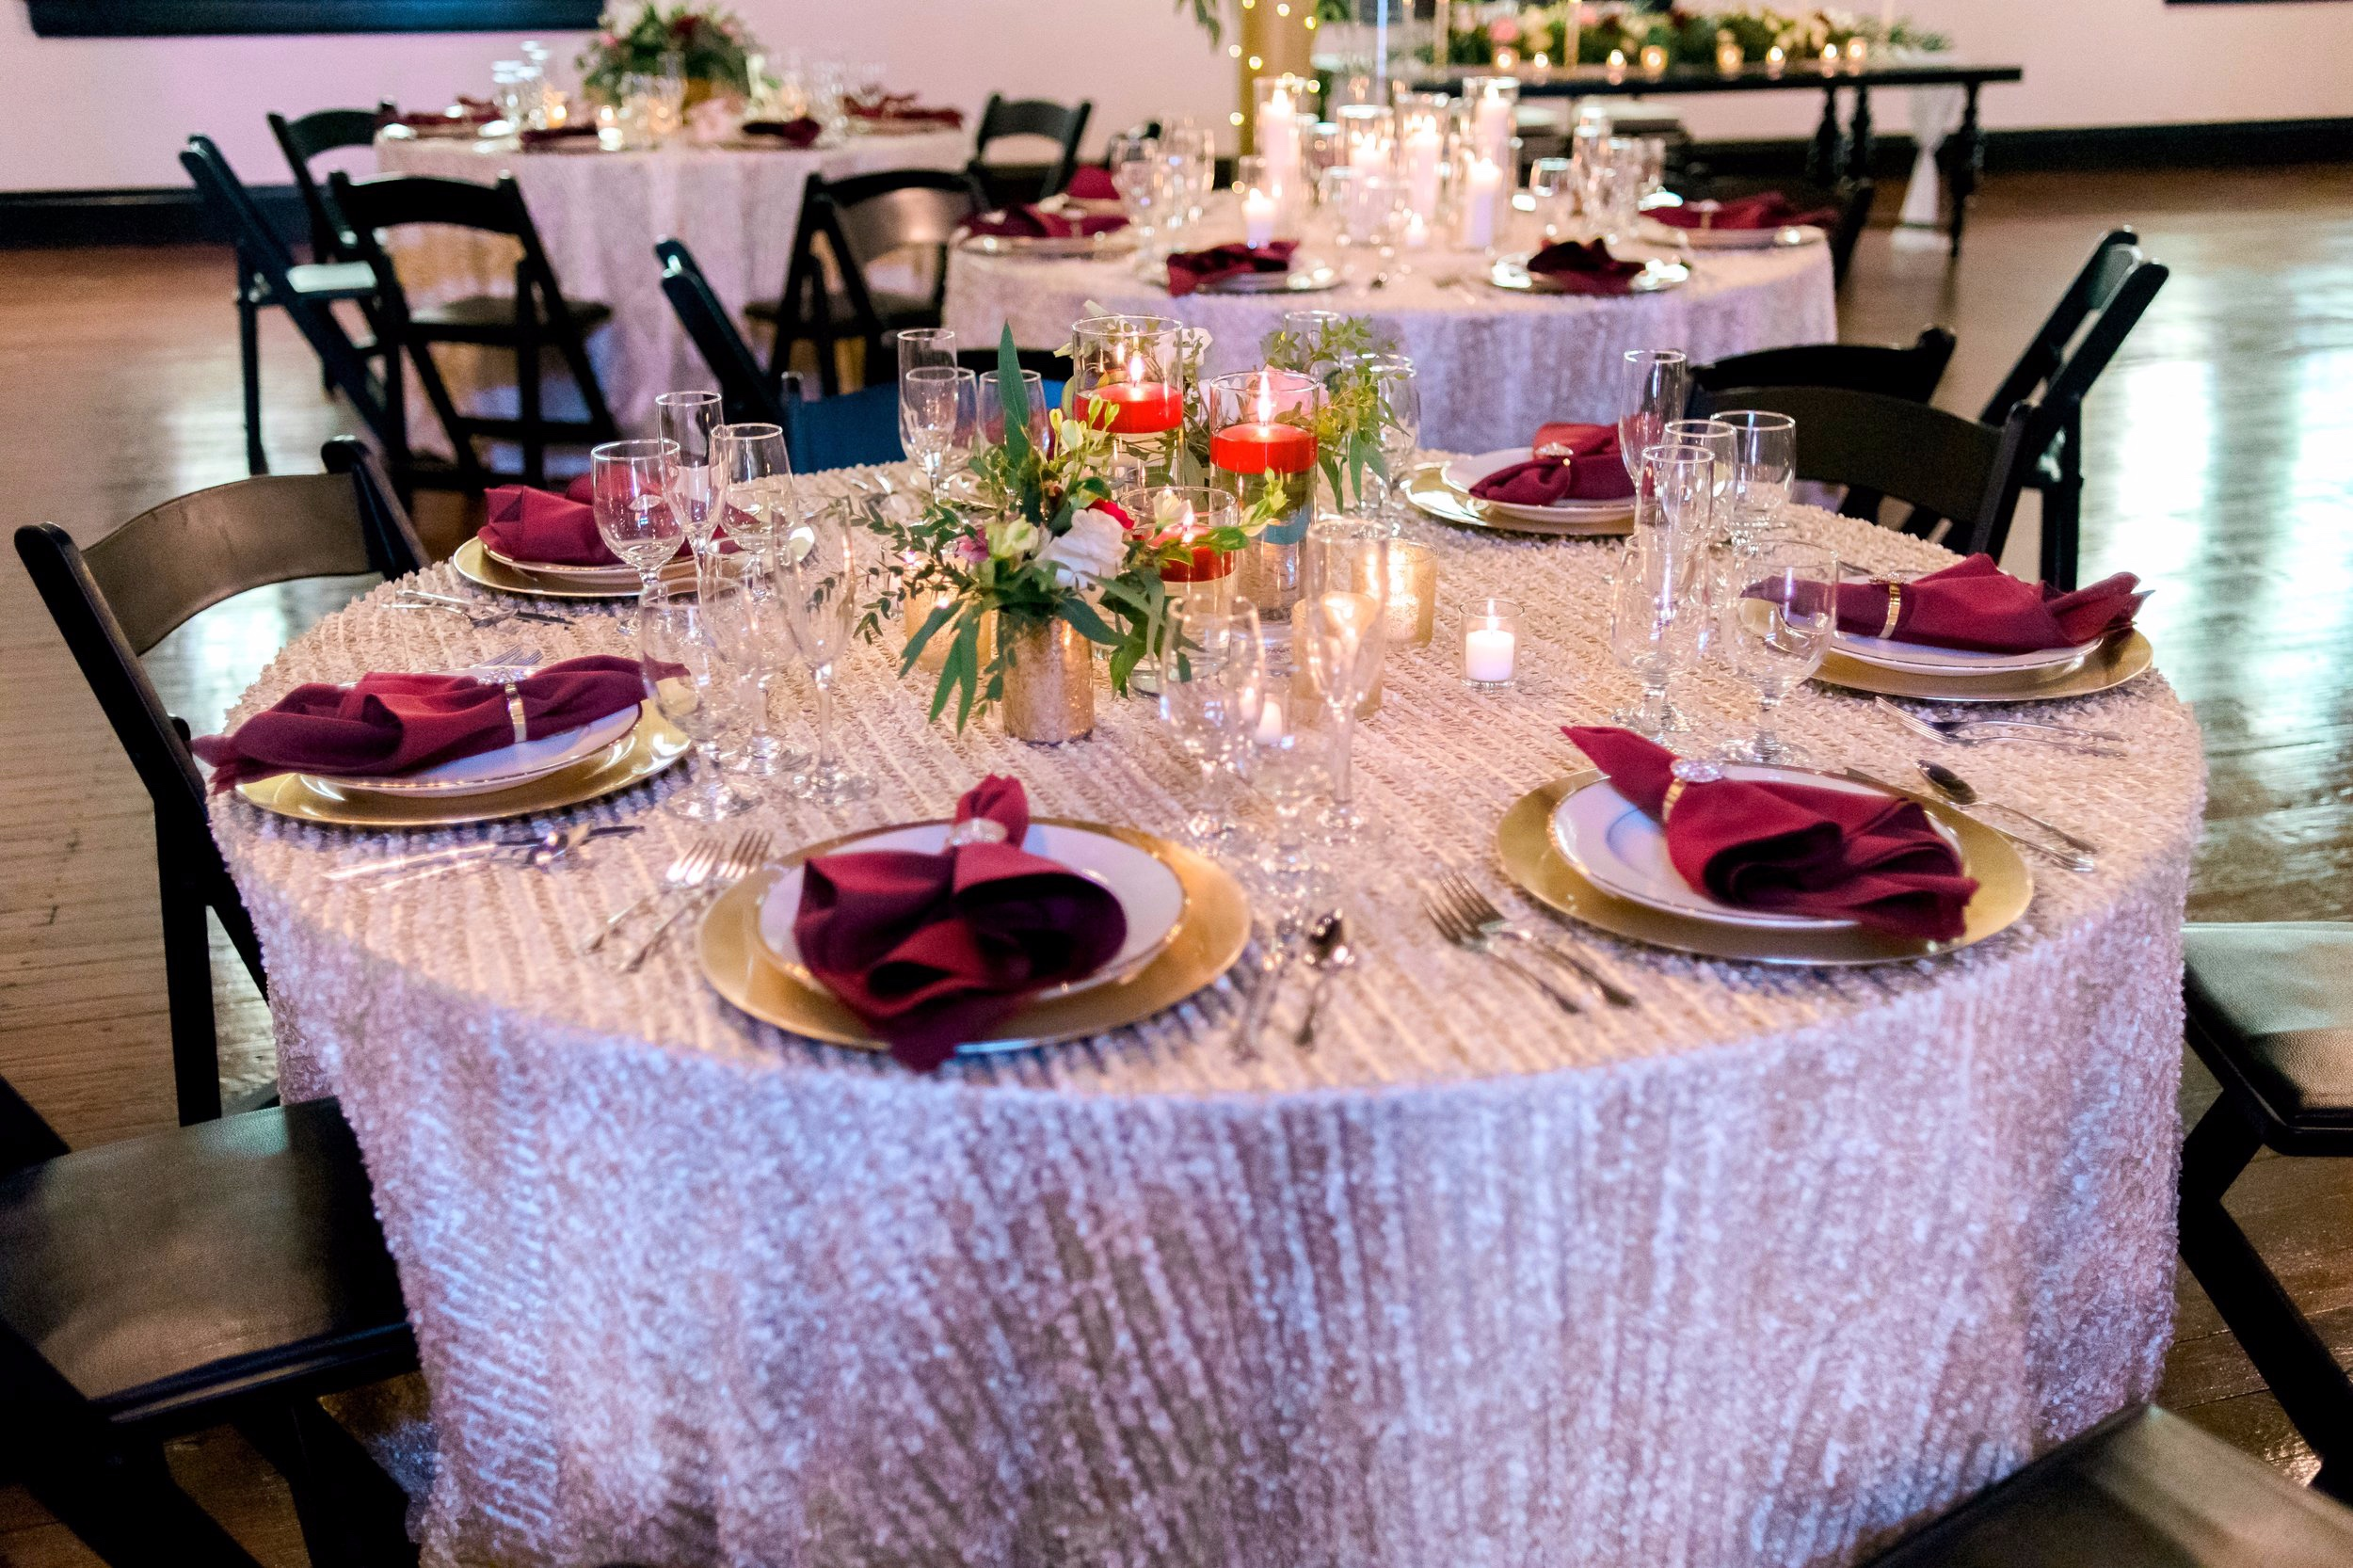 Guest table setup